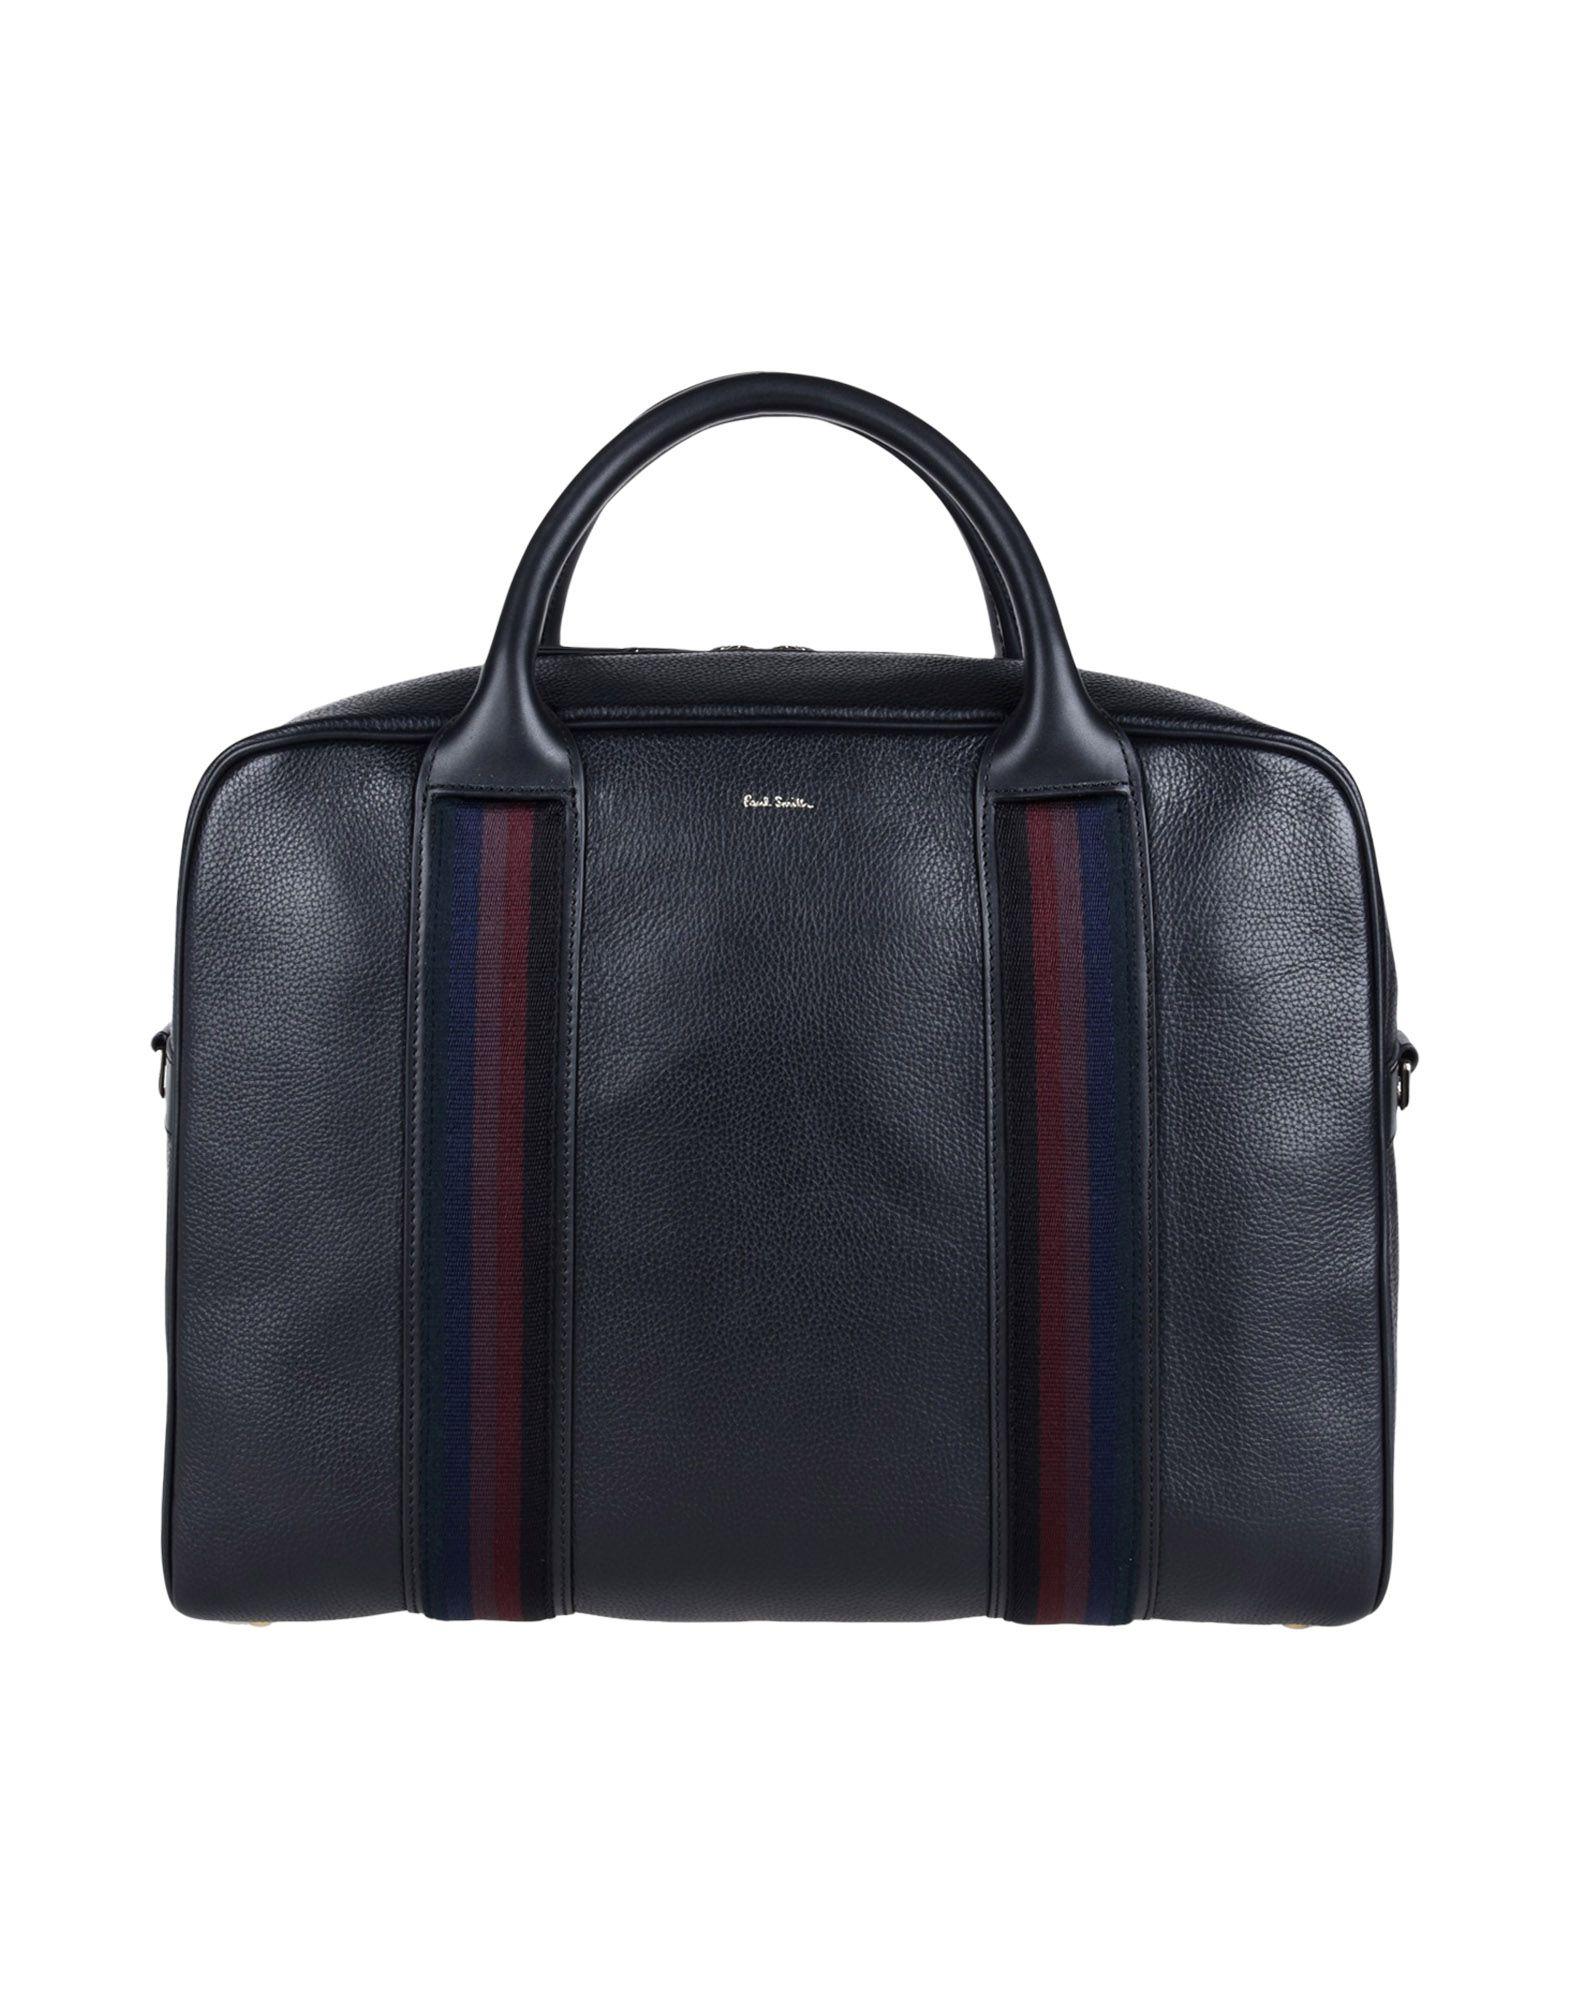 PAUL SMITH Деловые сумки timberland деловые сумки